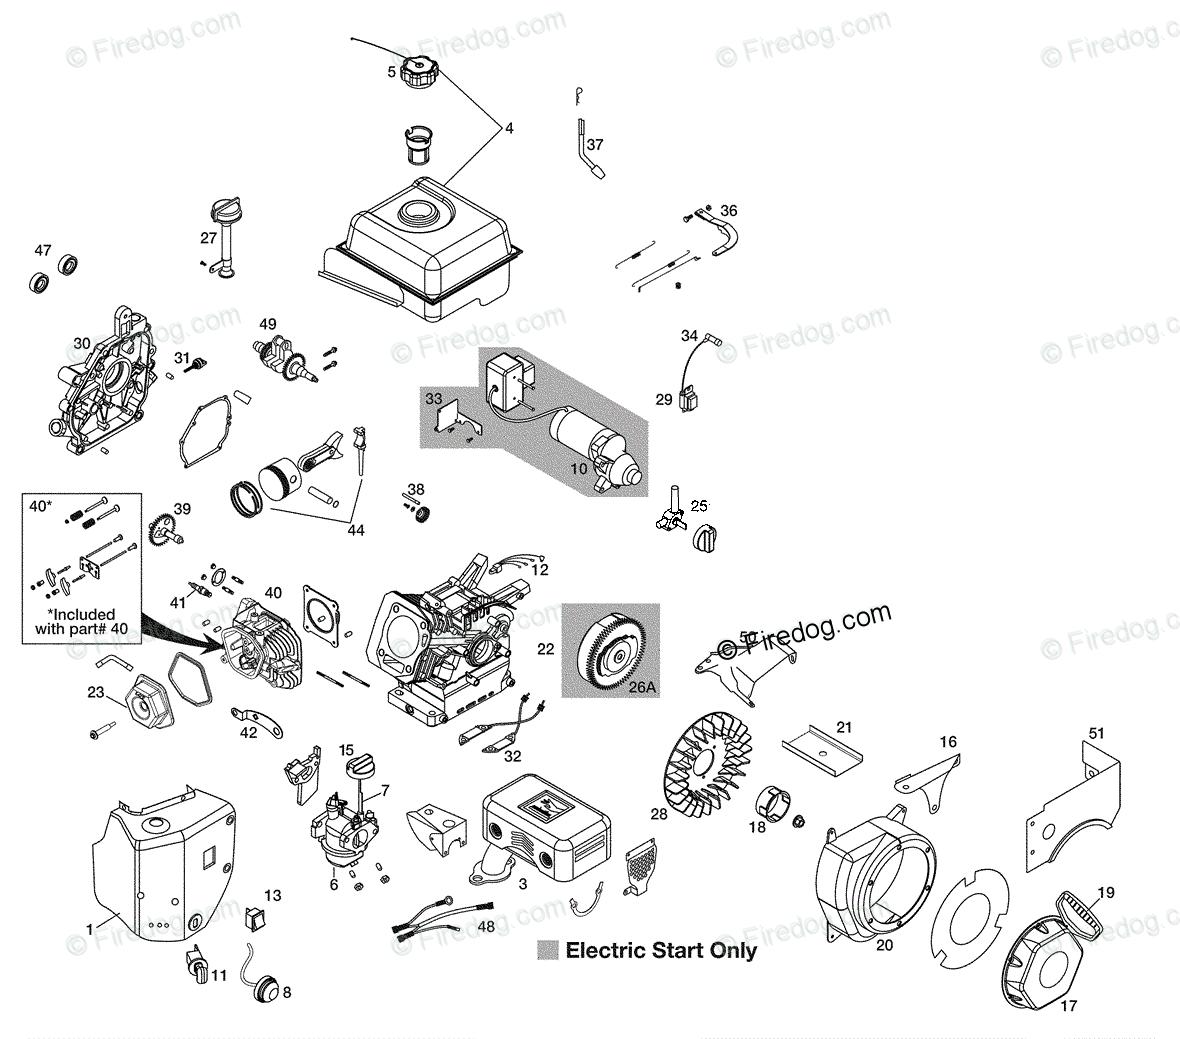 hight resolution of husqvarna snow blower 1827 sb 961930047 2009 07 oem parts diagram for engine firedog com